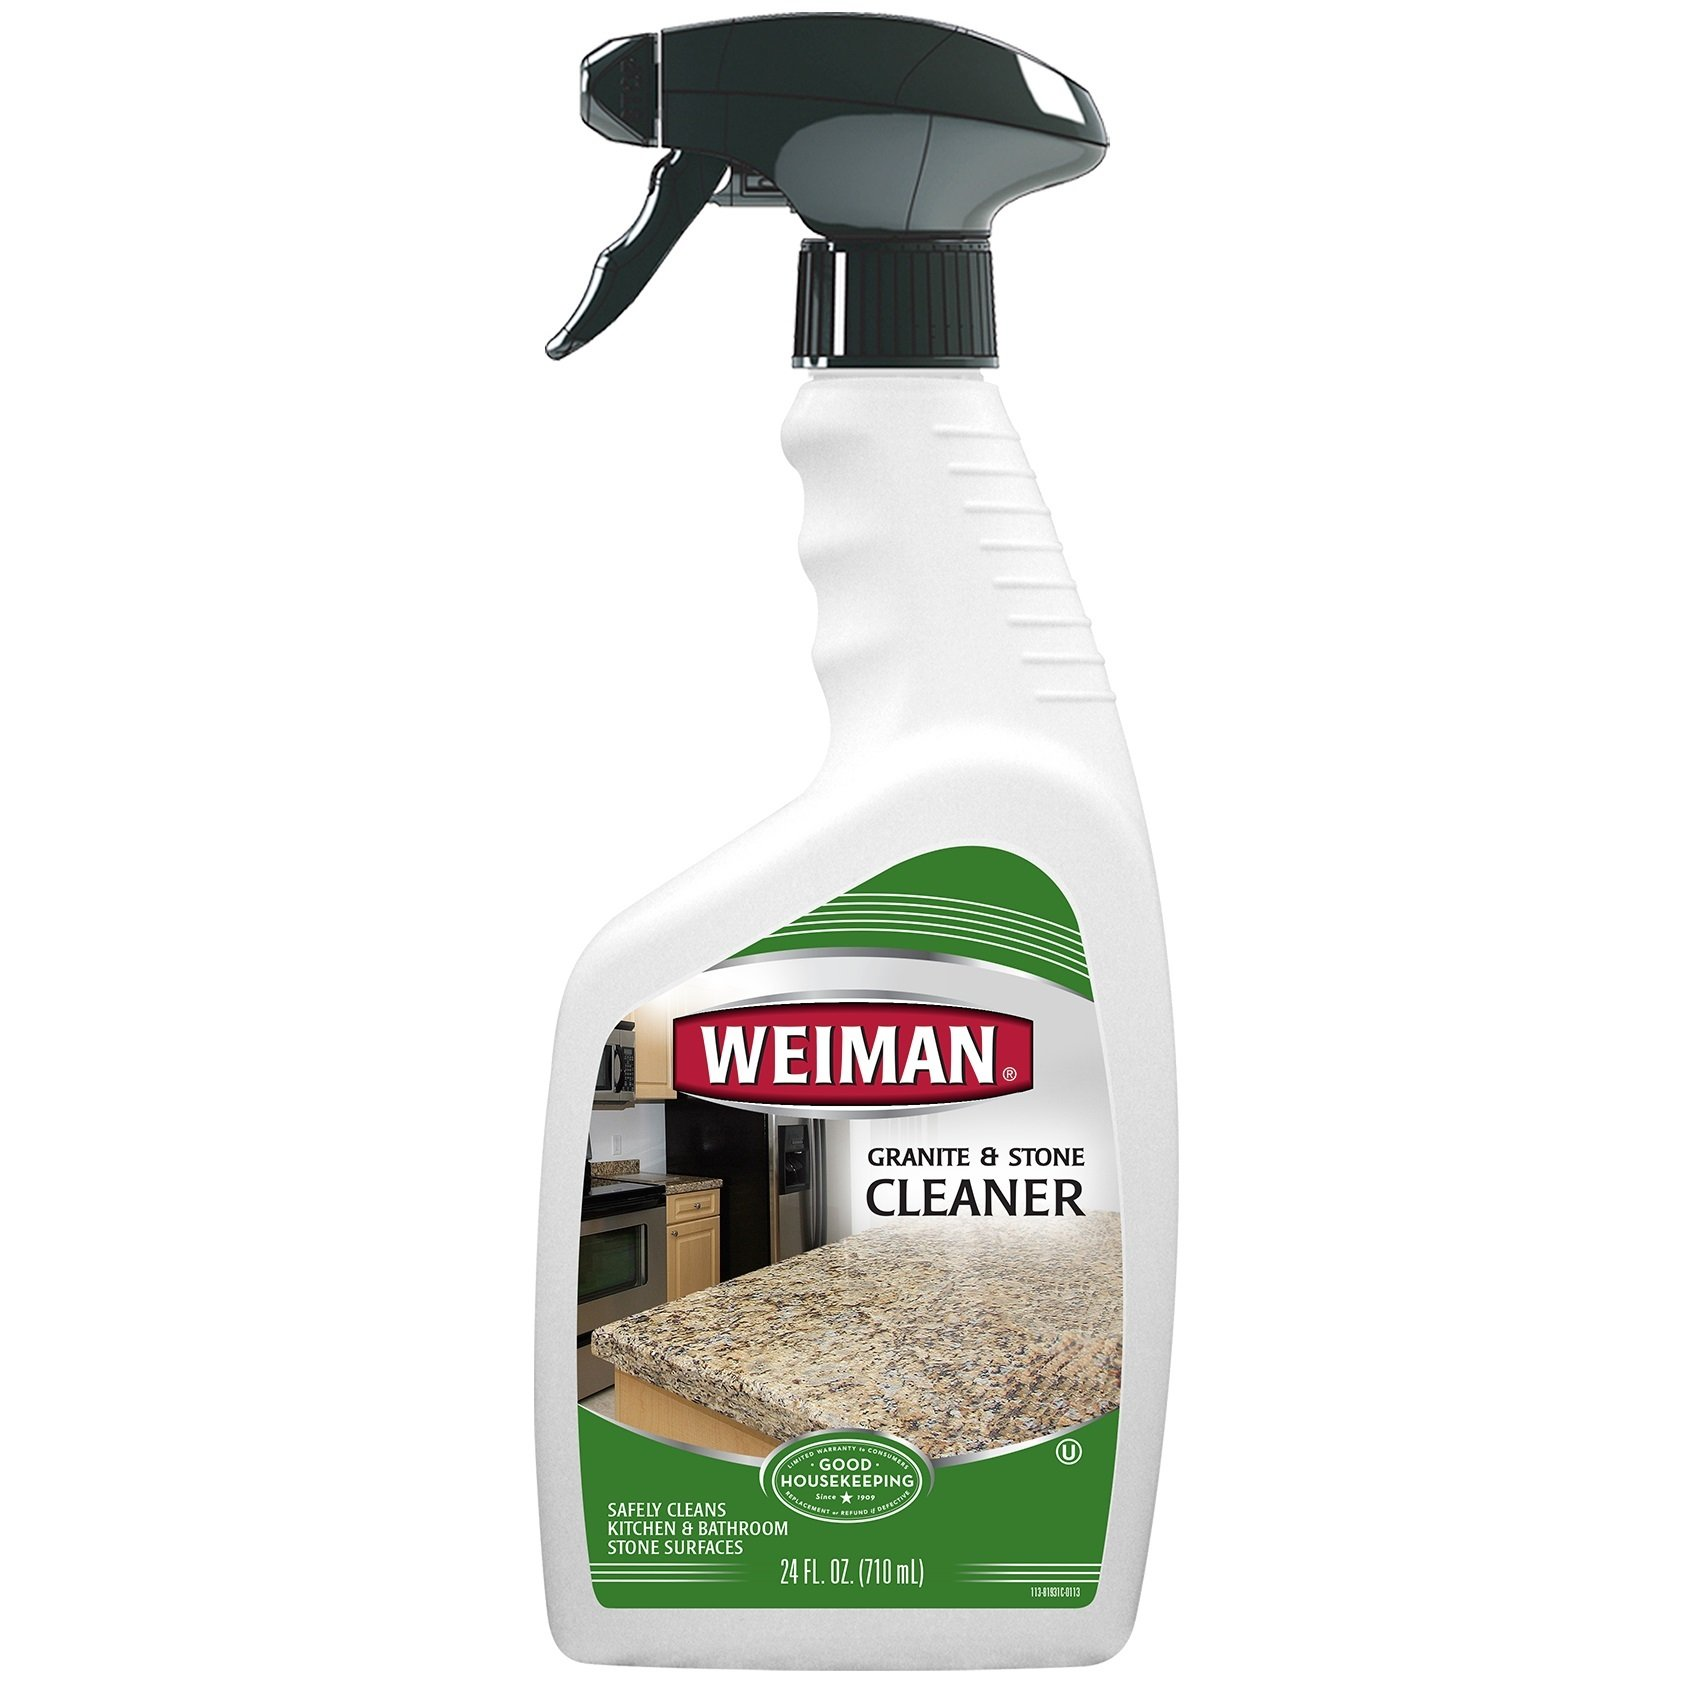 Weiman Granite Cleaner - 24 Ounce - For Granite Marble Soapstone Quartz Quartzite Slate Limestone Corian Laminate Tile Countertop and More by Weiman